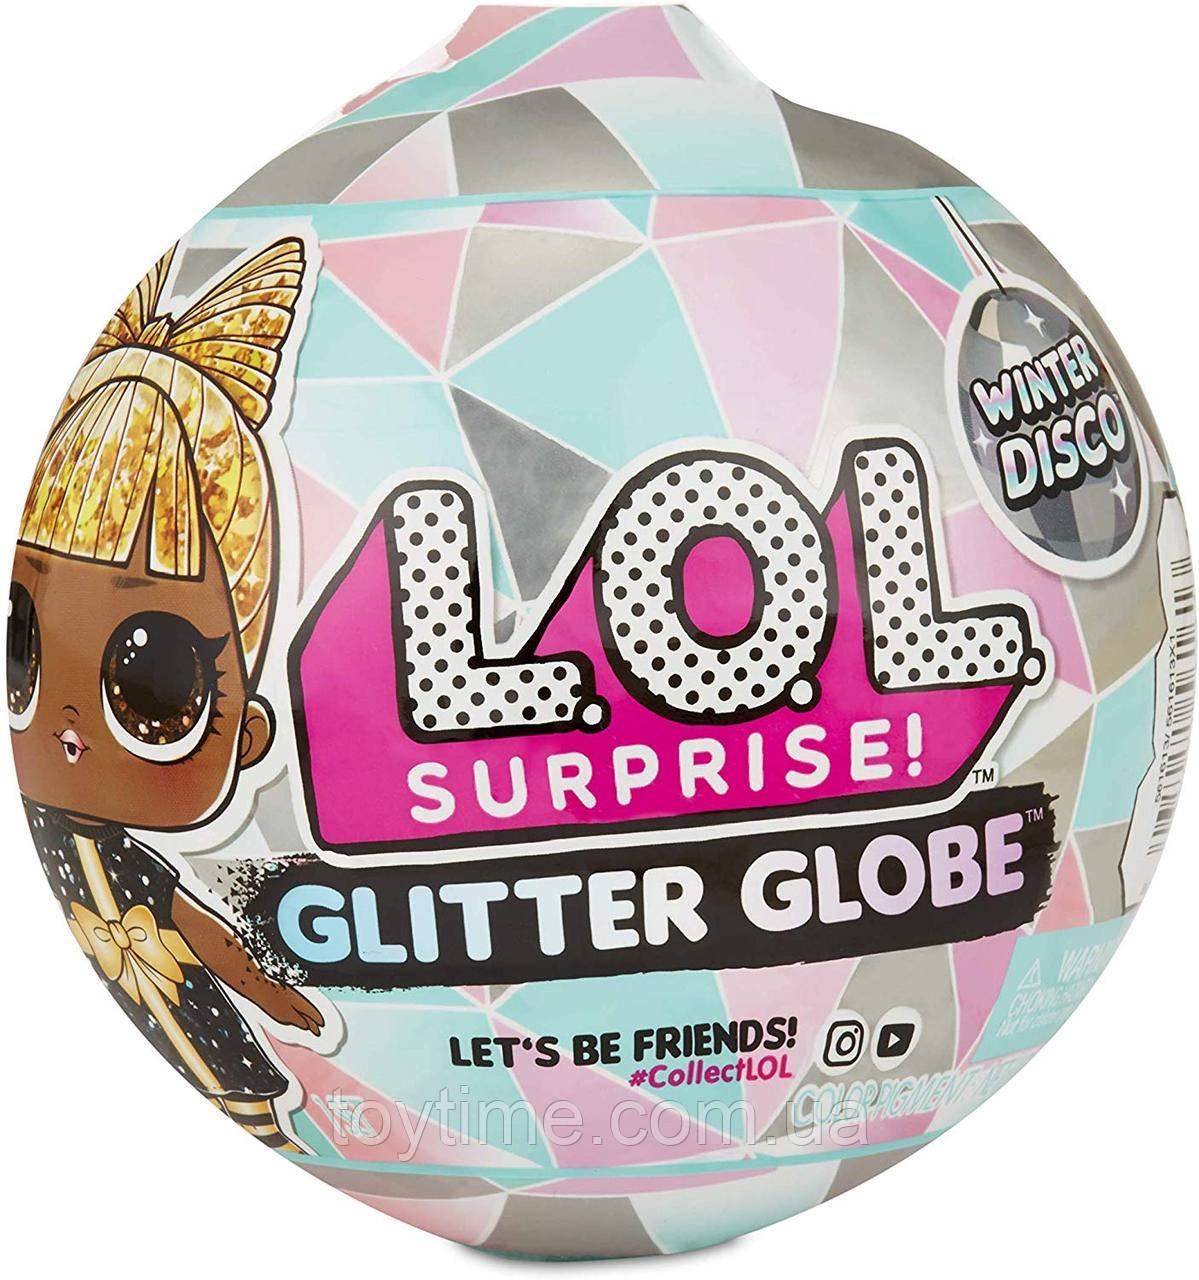 ЛОЛ Зимнее Диско Блестящий шар / L.O.L. Surprise! Glitter Globe Doll Winter Disco Series with Glitter Hair